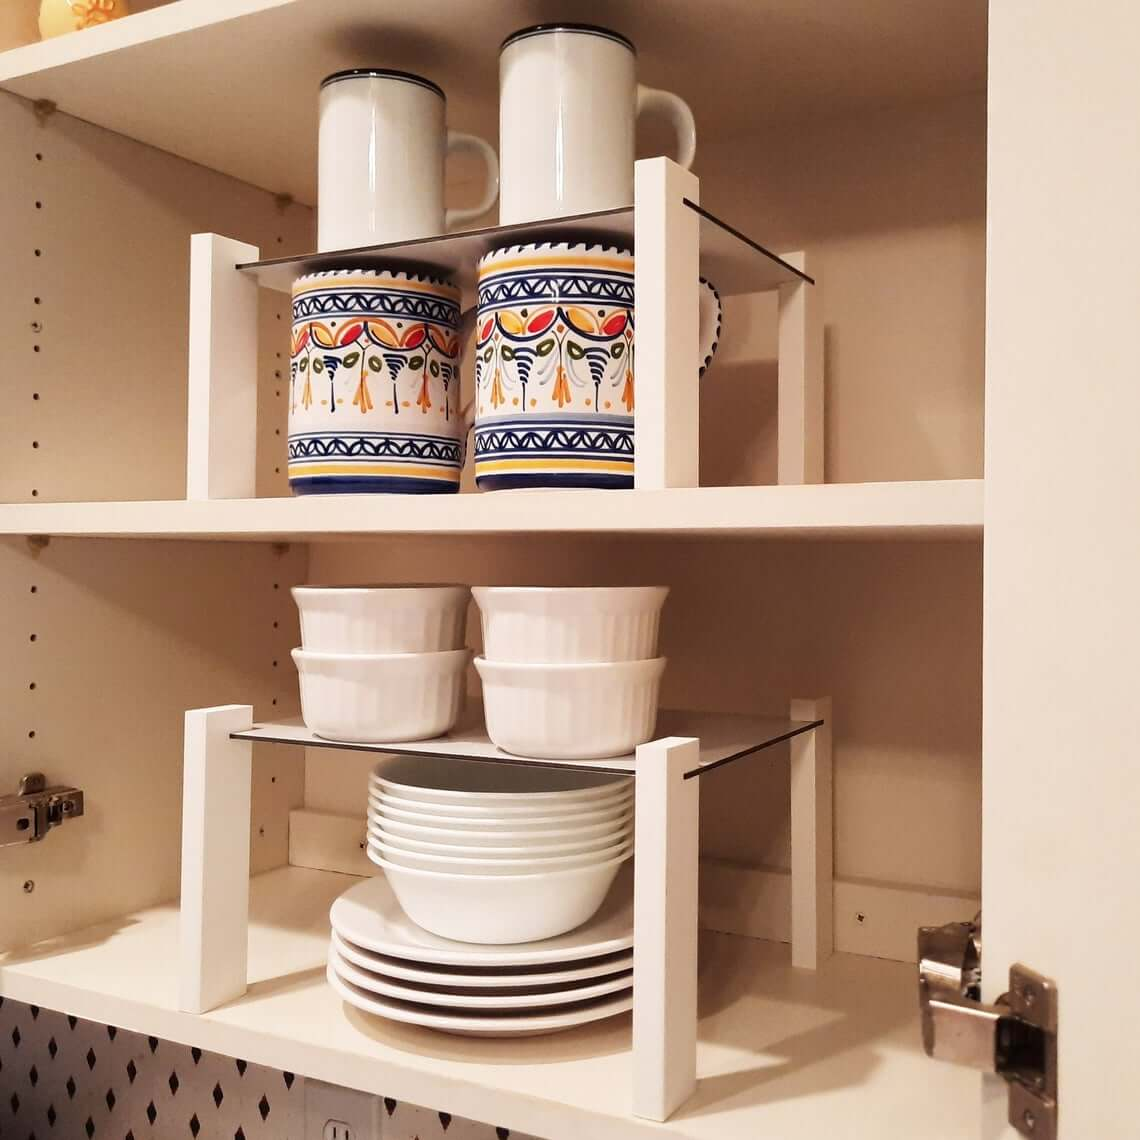 Raised Cabinet Storage Shelf Organizer